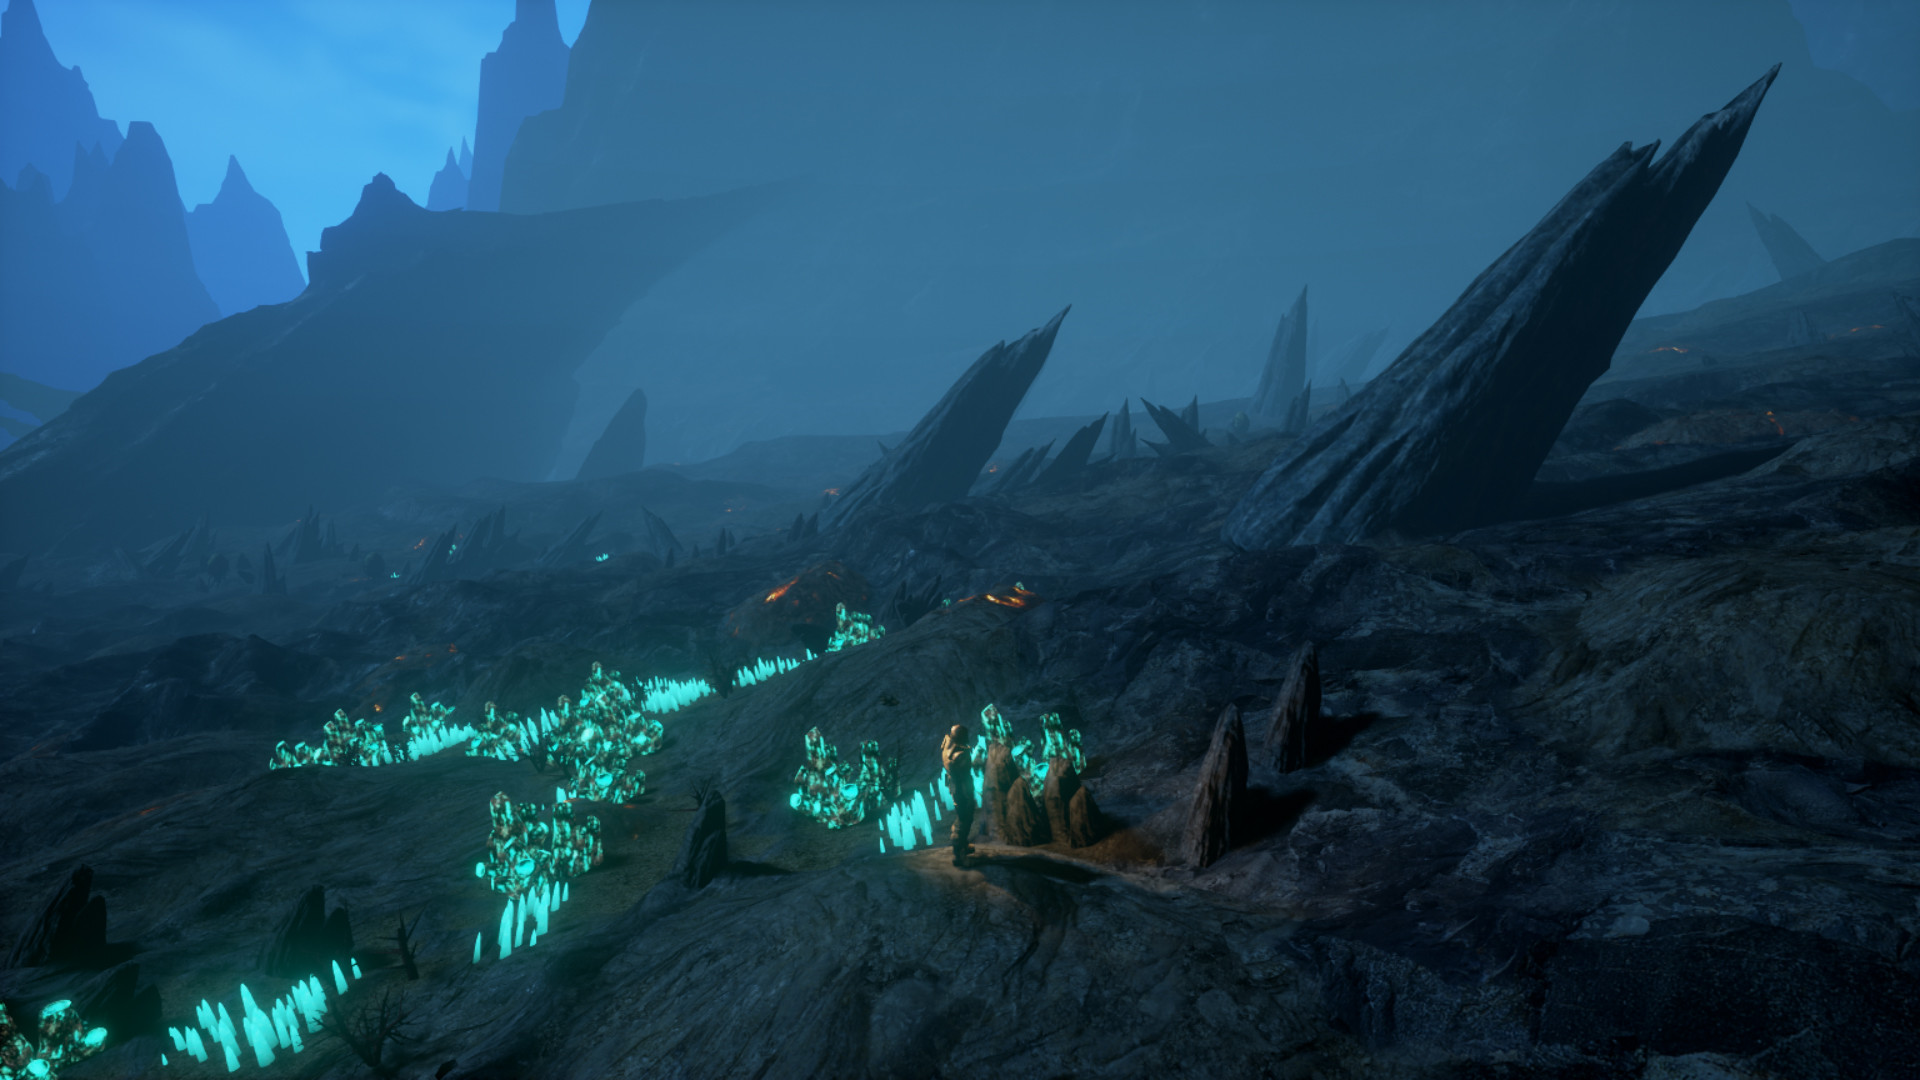 bohan-sun-alien-screenshot.jpg